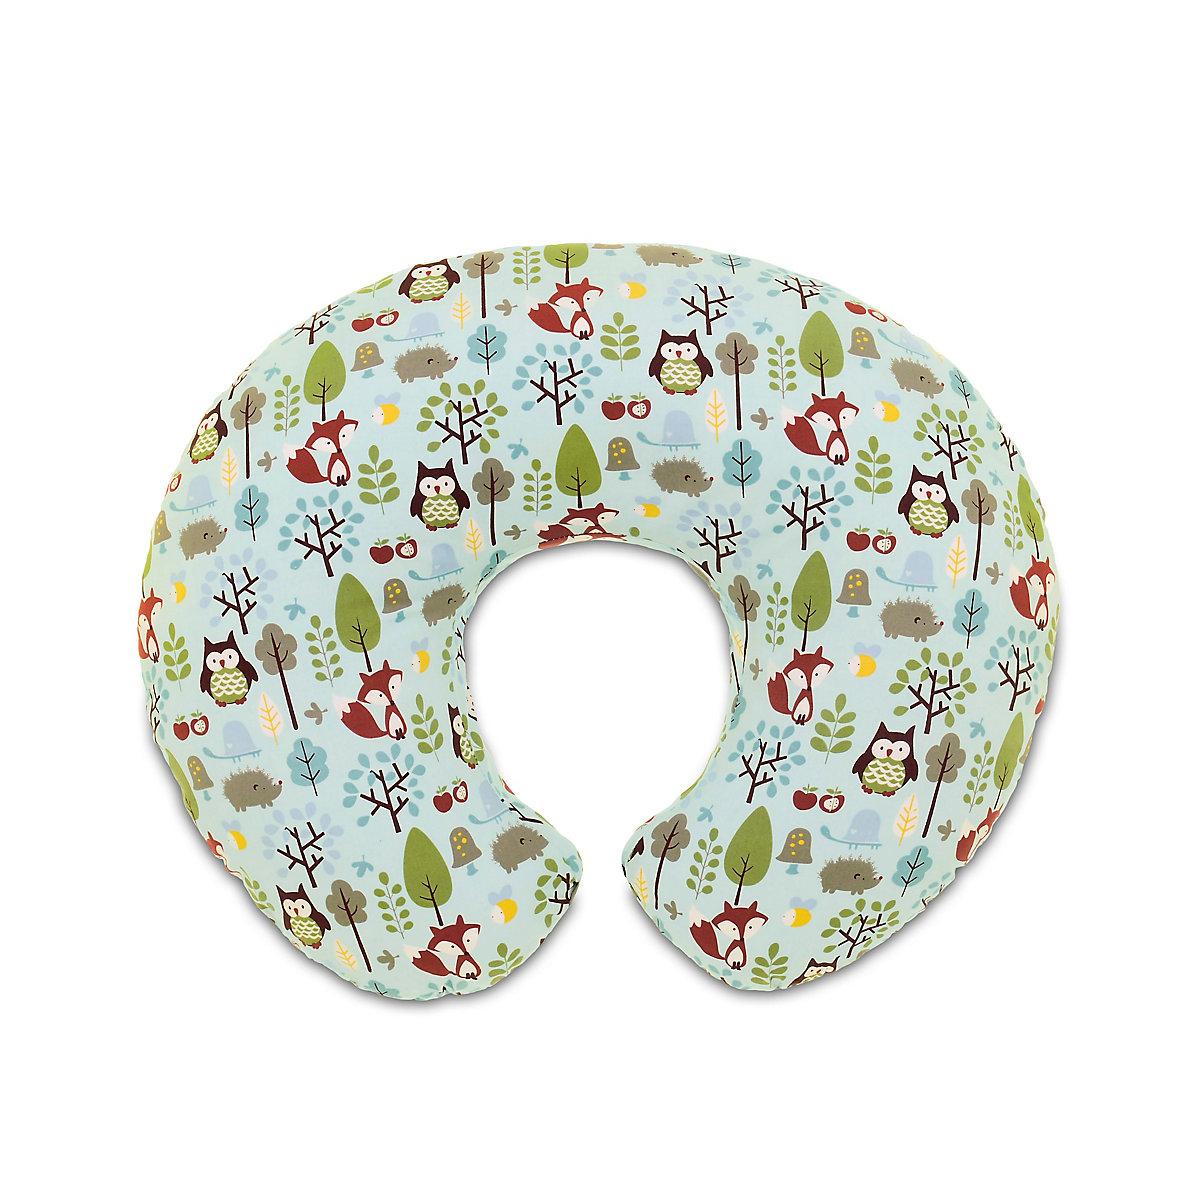 Chicco boppy pillow - woodsie